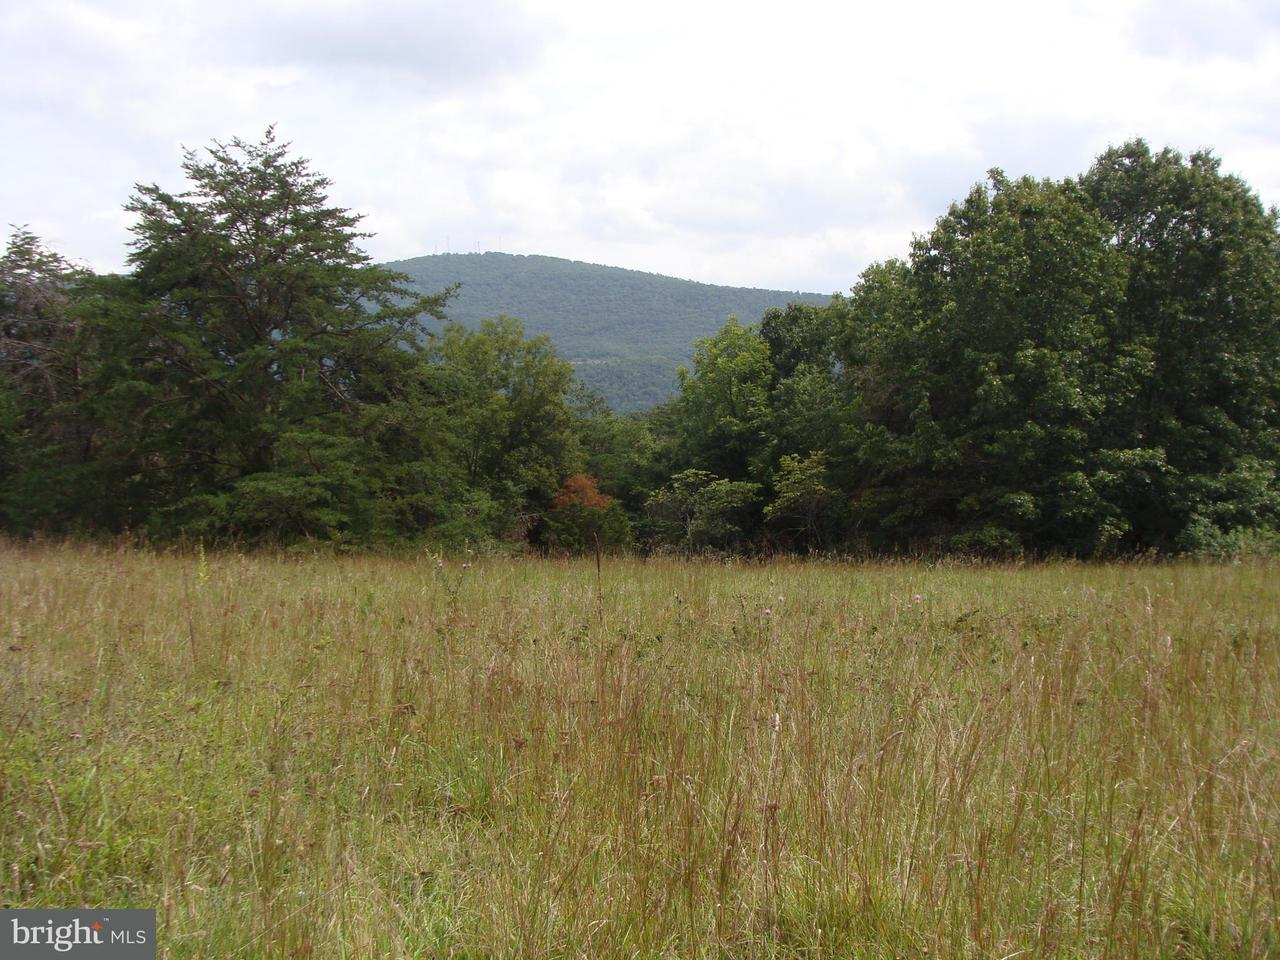 Land for Sale at Lot 6 West Ridge Dr Arthur, West Virginia 26847 United States